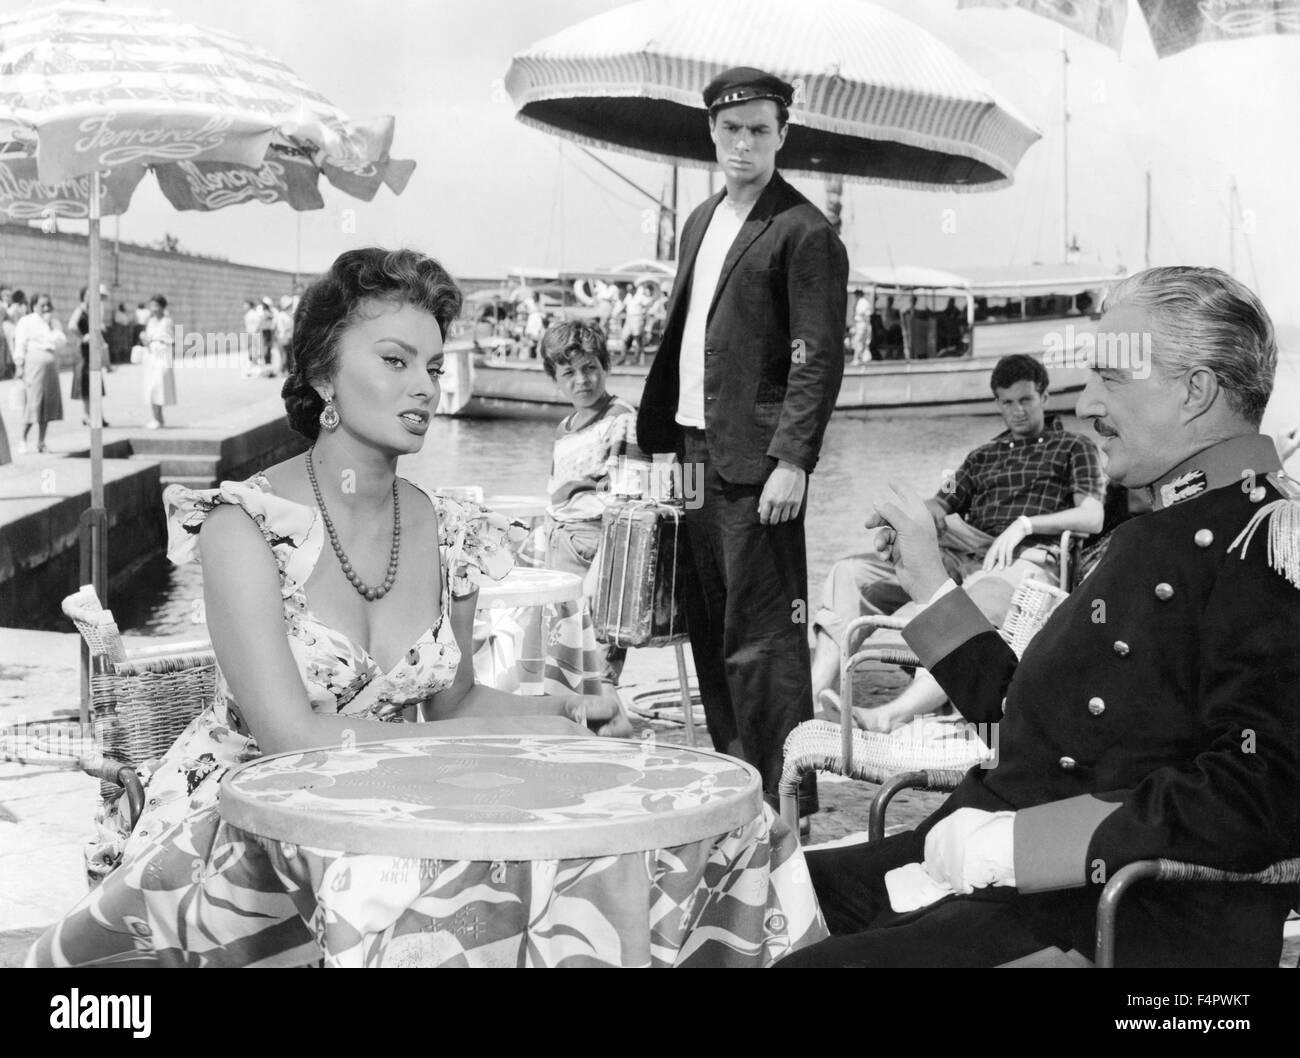 Sophia Loren and Vittorio De Sica / Scandal in Sorrento / 1955 directed by Dino Risi [Titanus / Pathe Consortium] - Stock Image